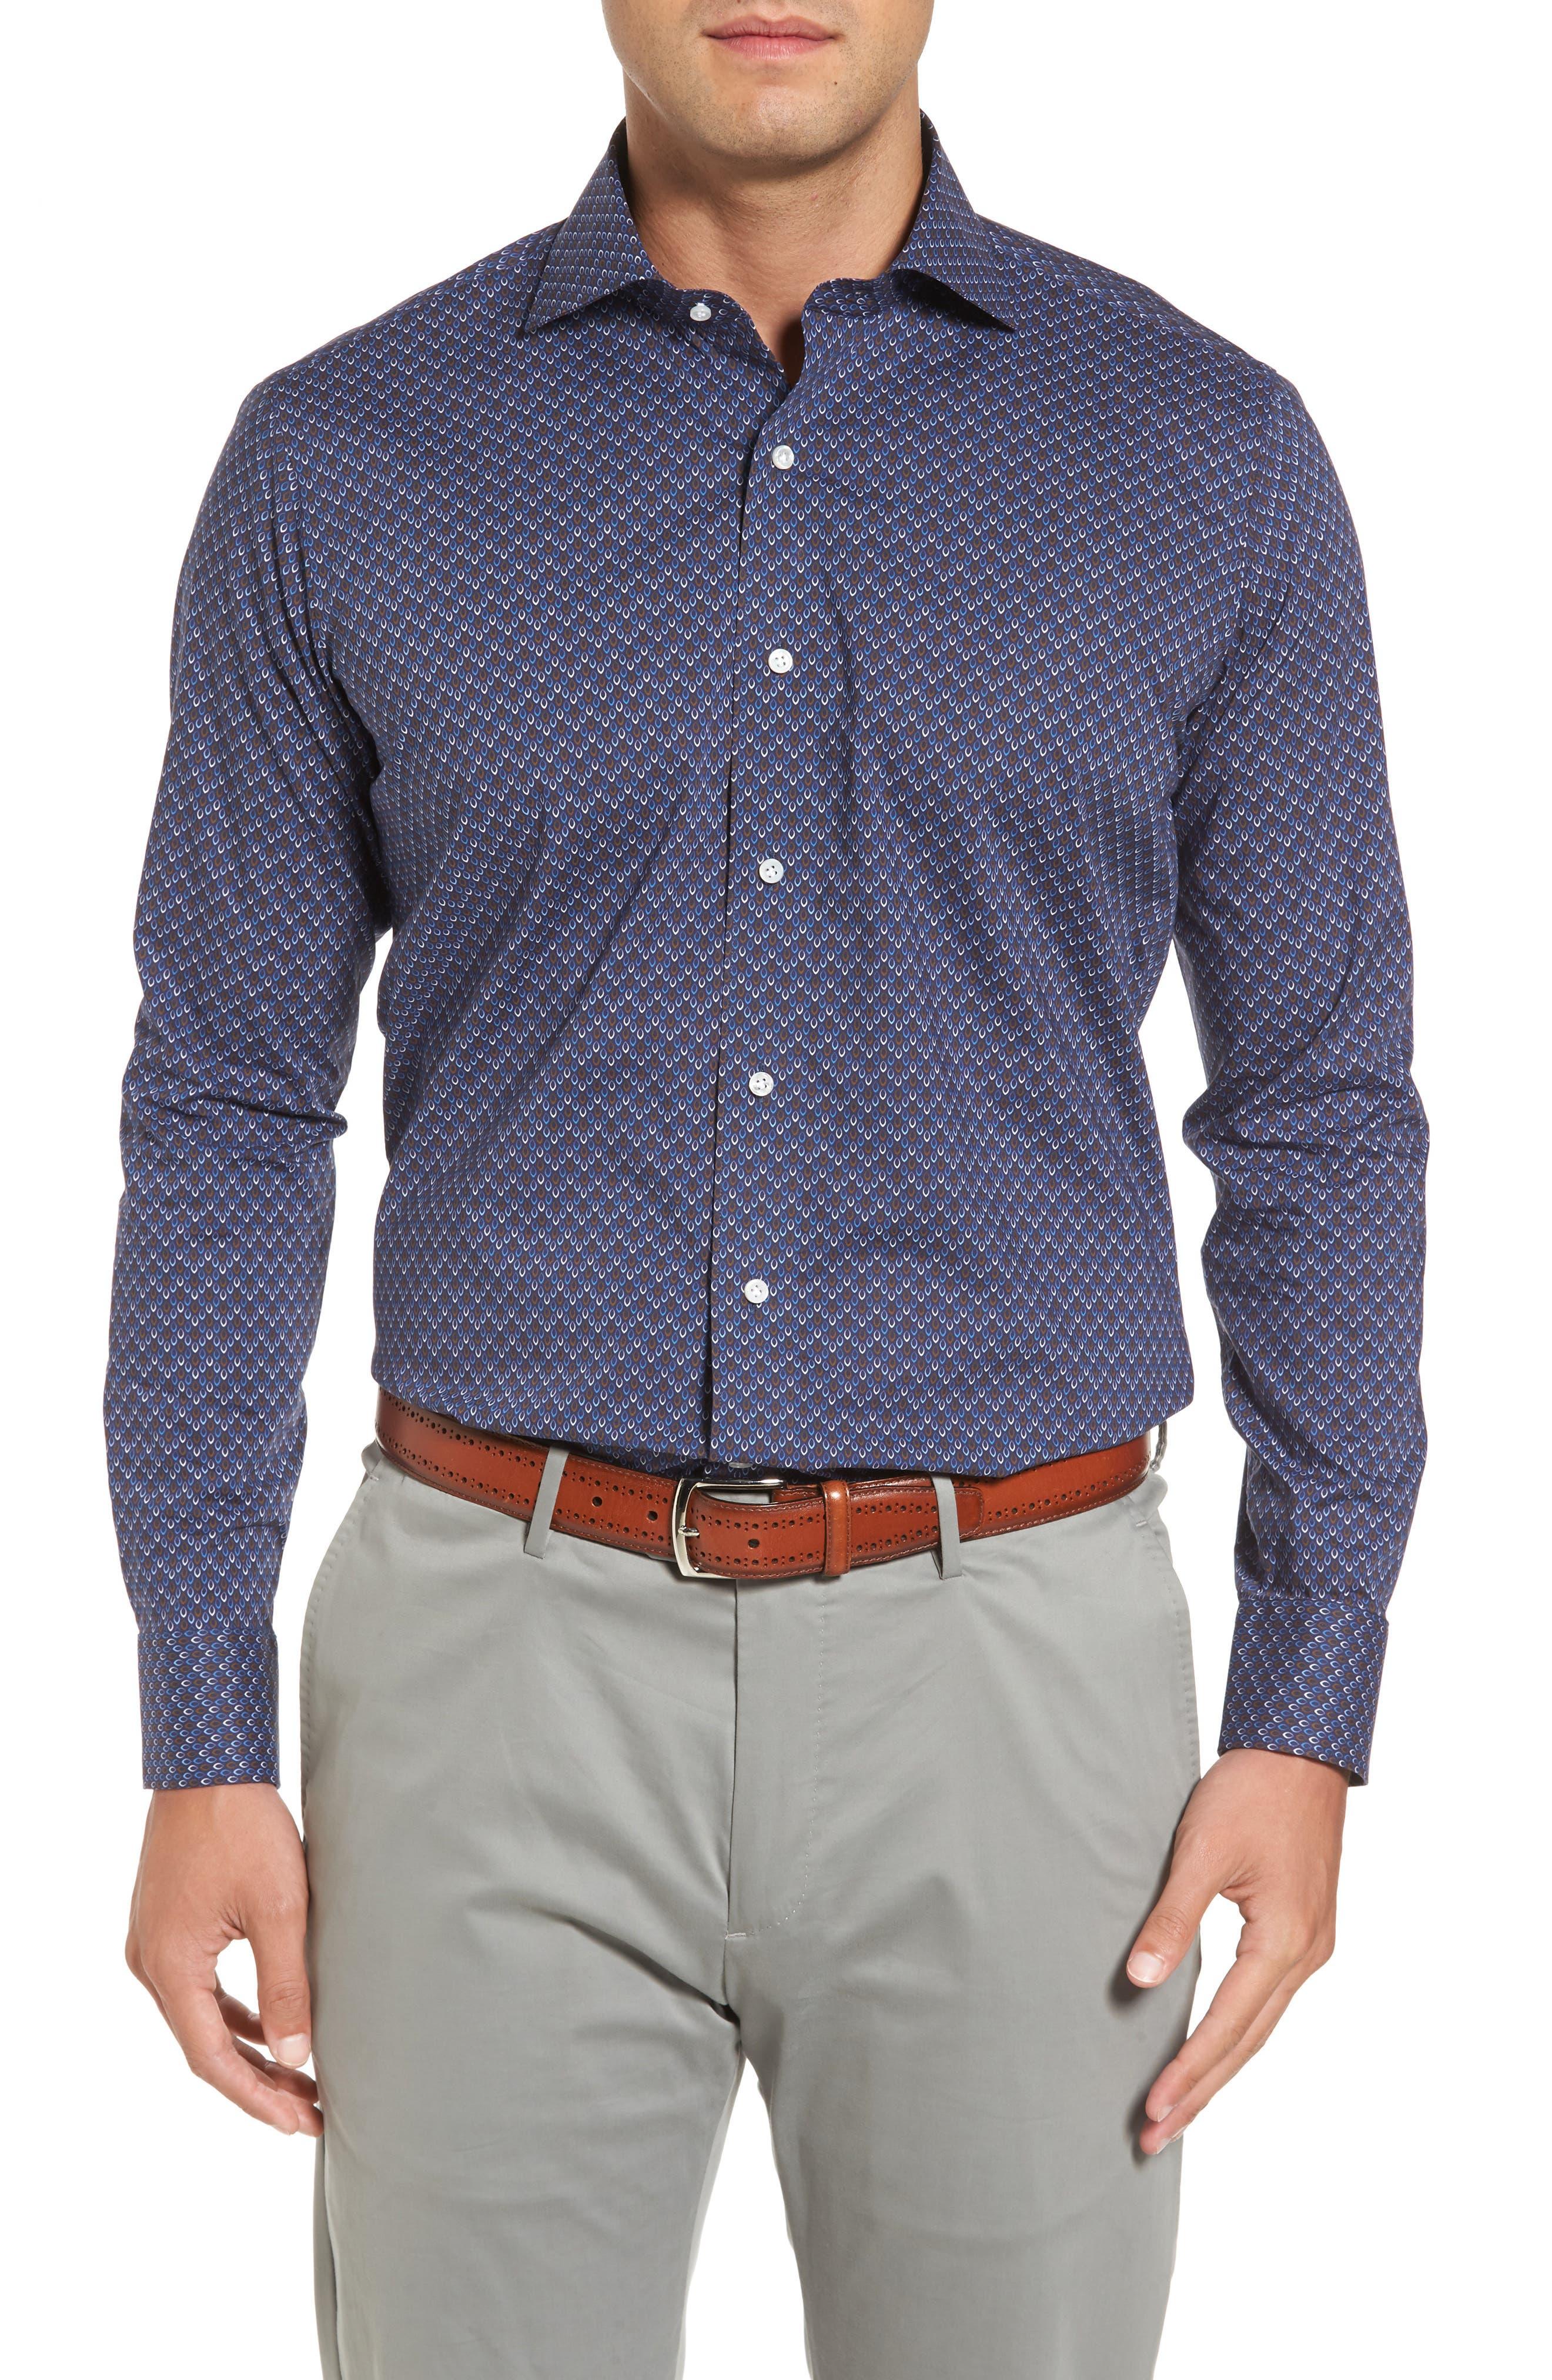 Twillingate Regular Fit Print Sport Shirt,                         Main,                         color, Blue